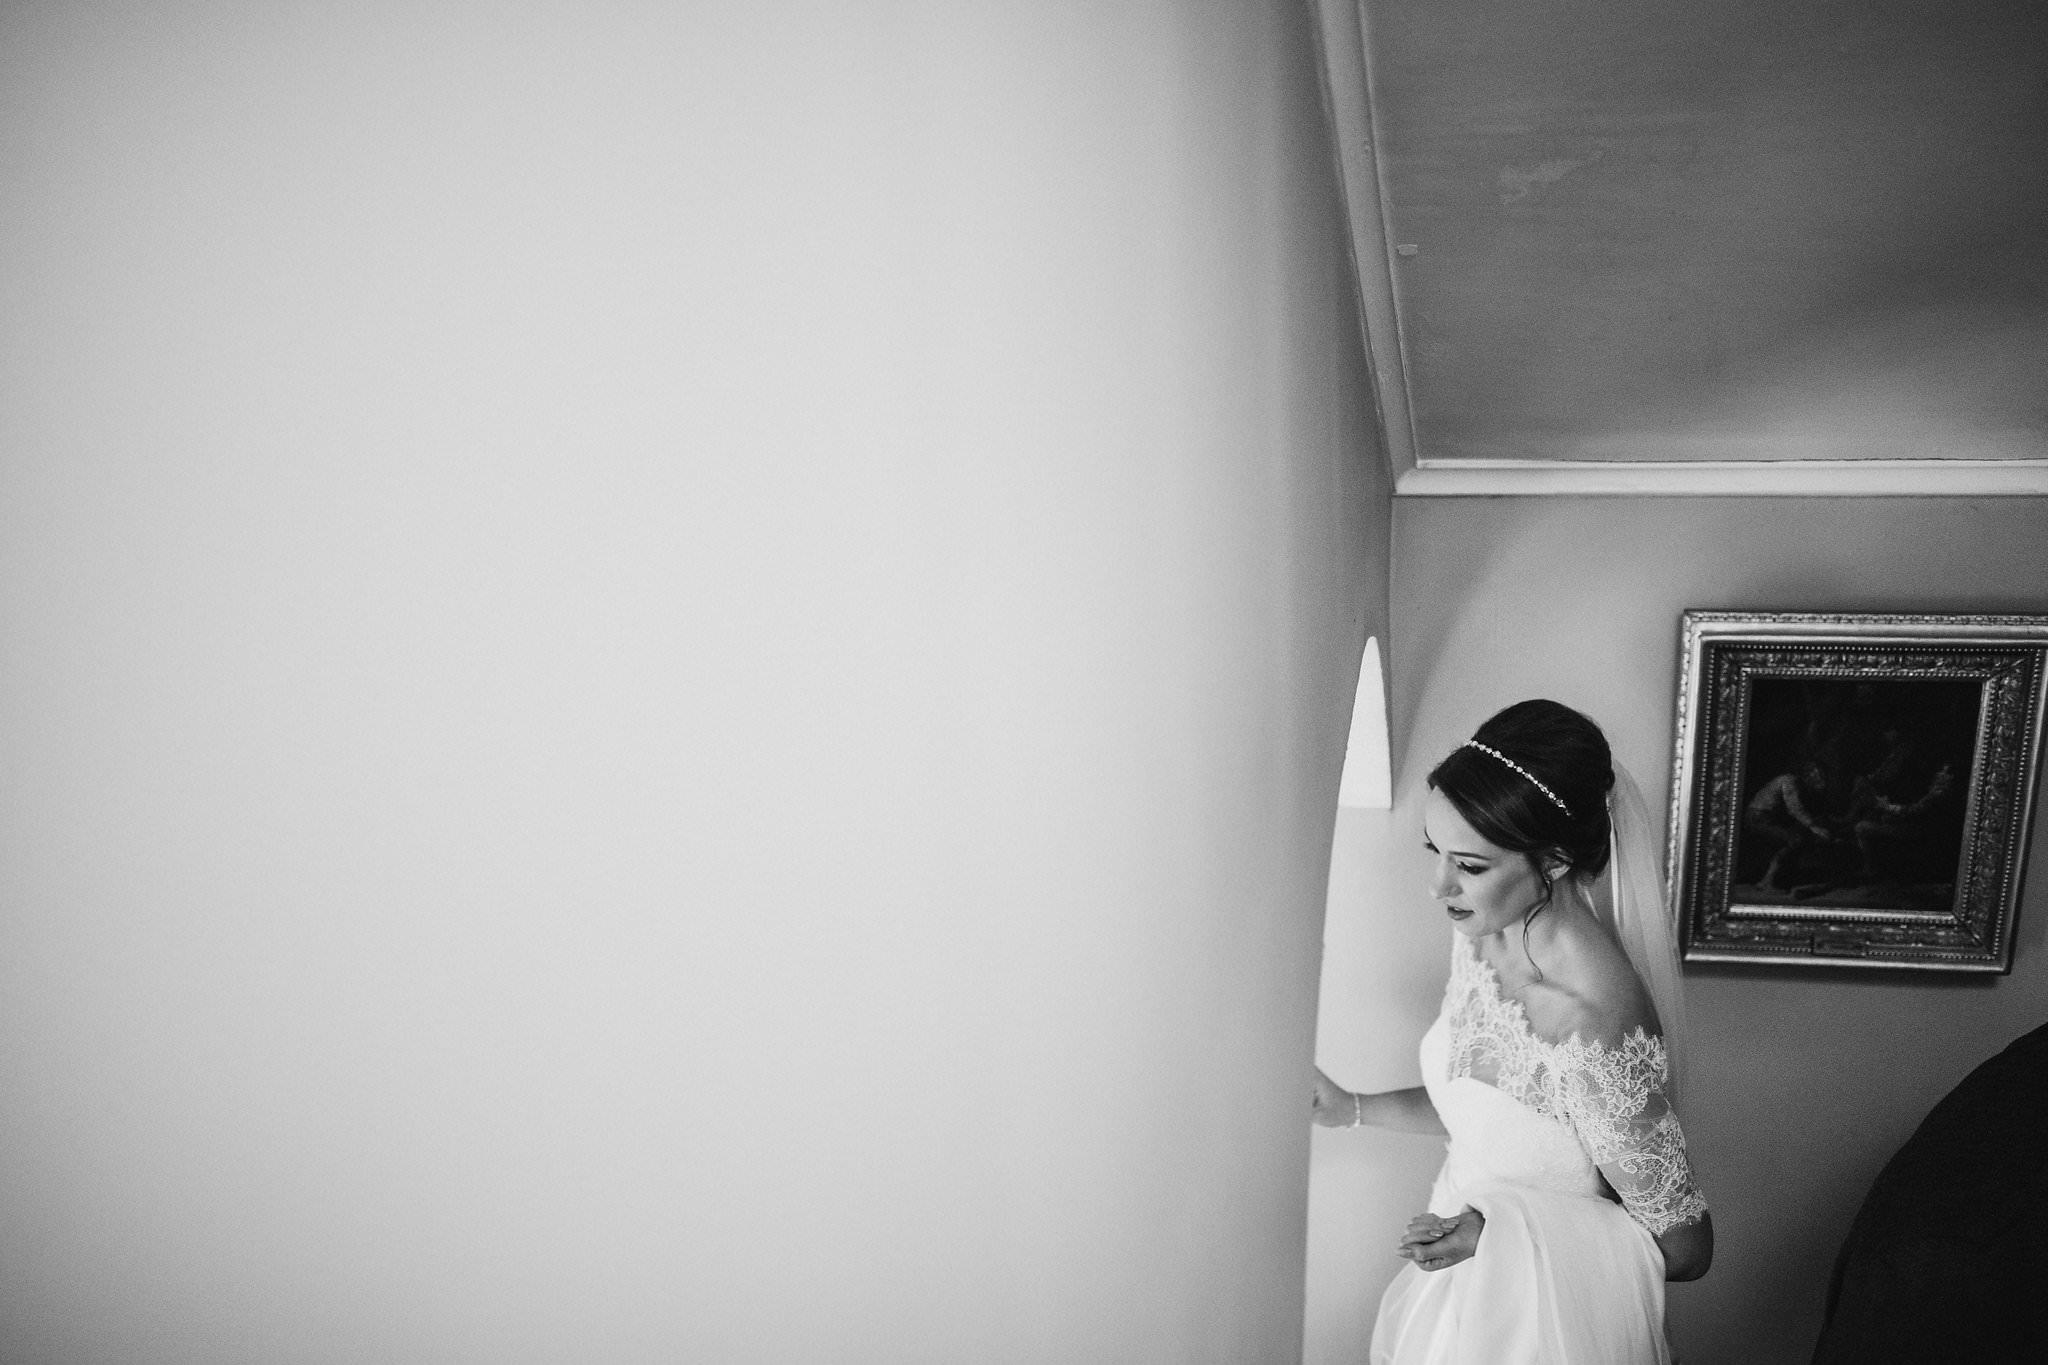 kirknewton stables wedding photographer (23).jpg